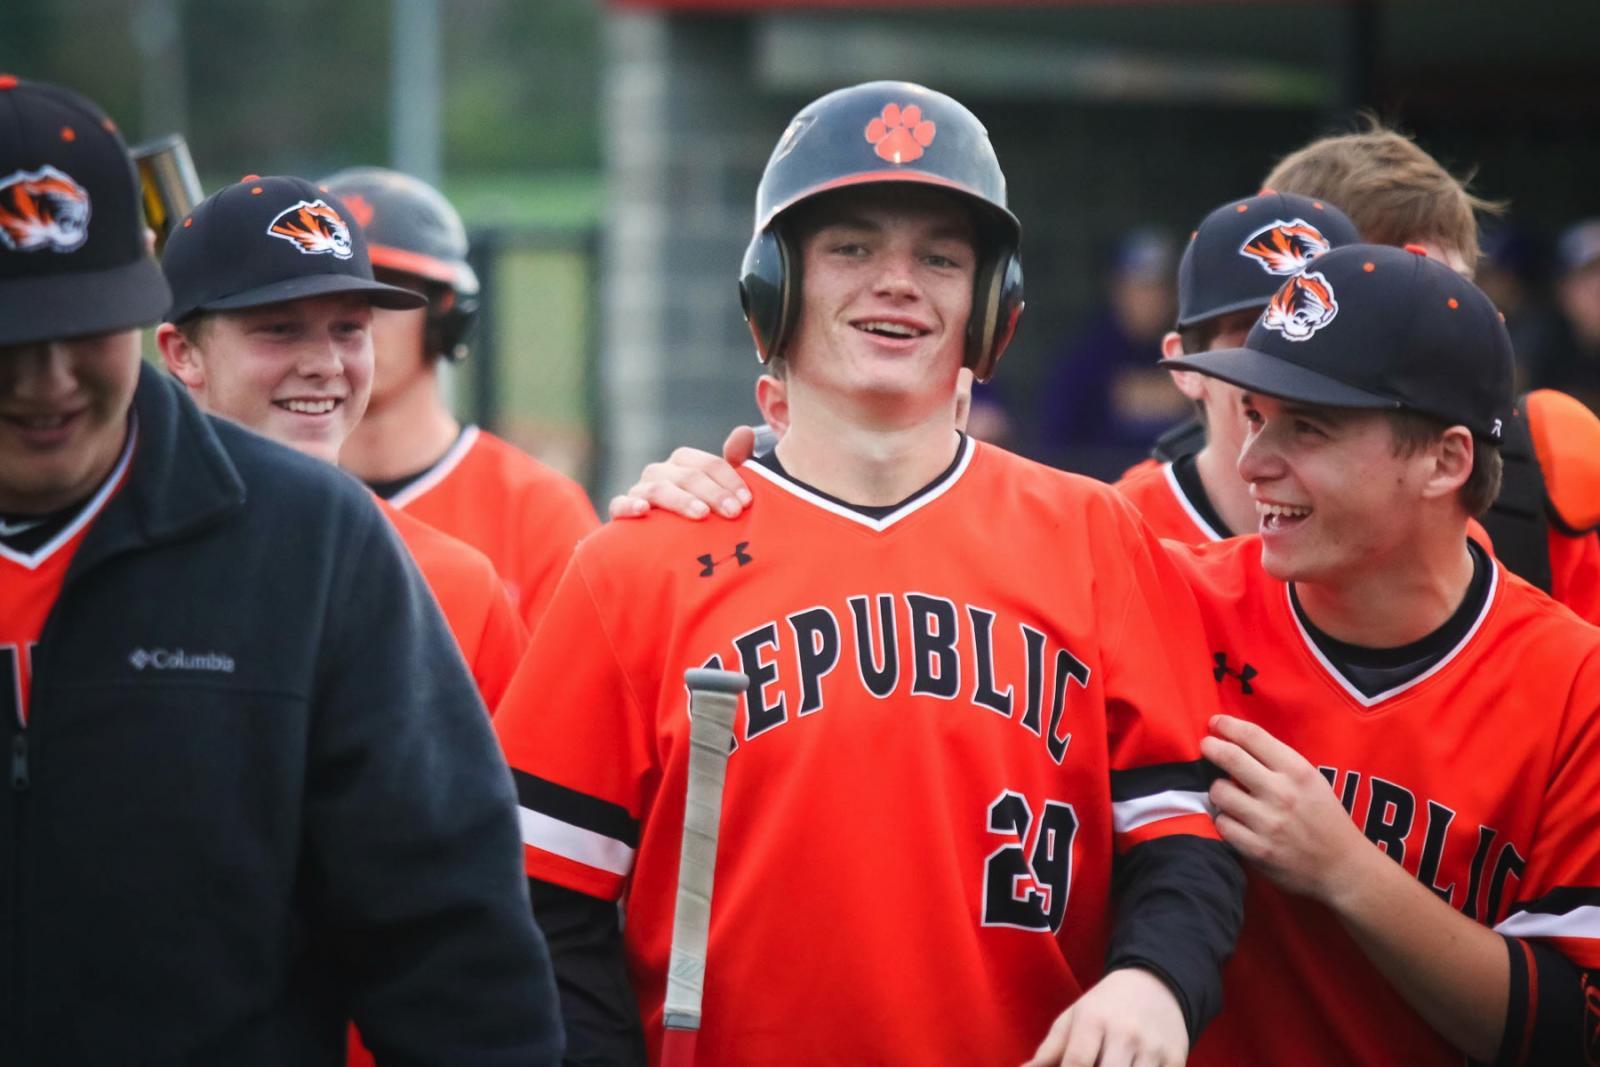 Beck's Blast Highlights Tigers' 1st Win